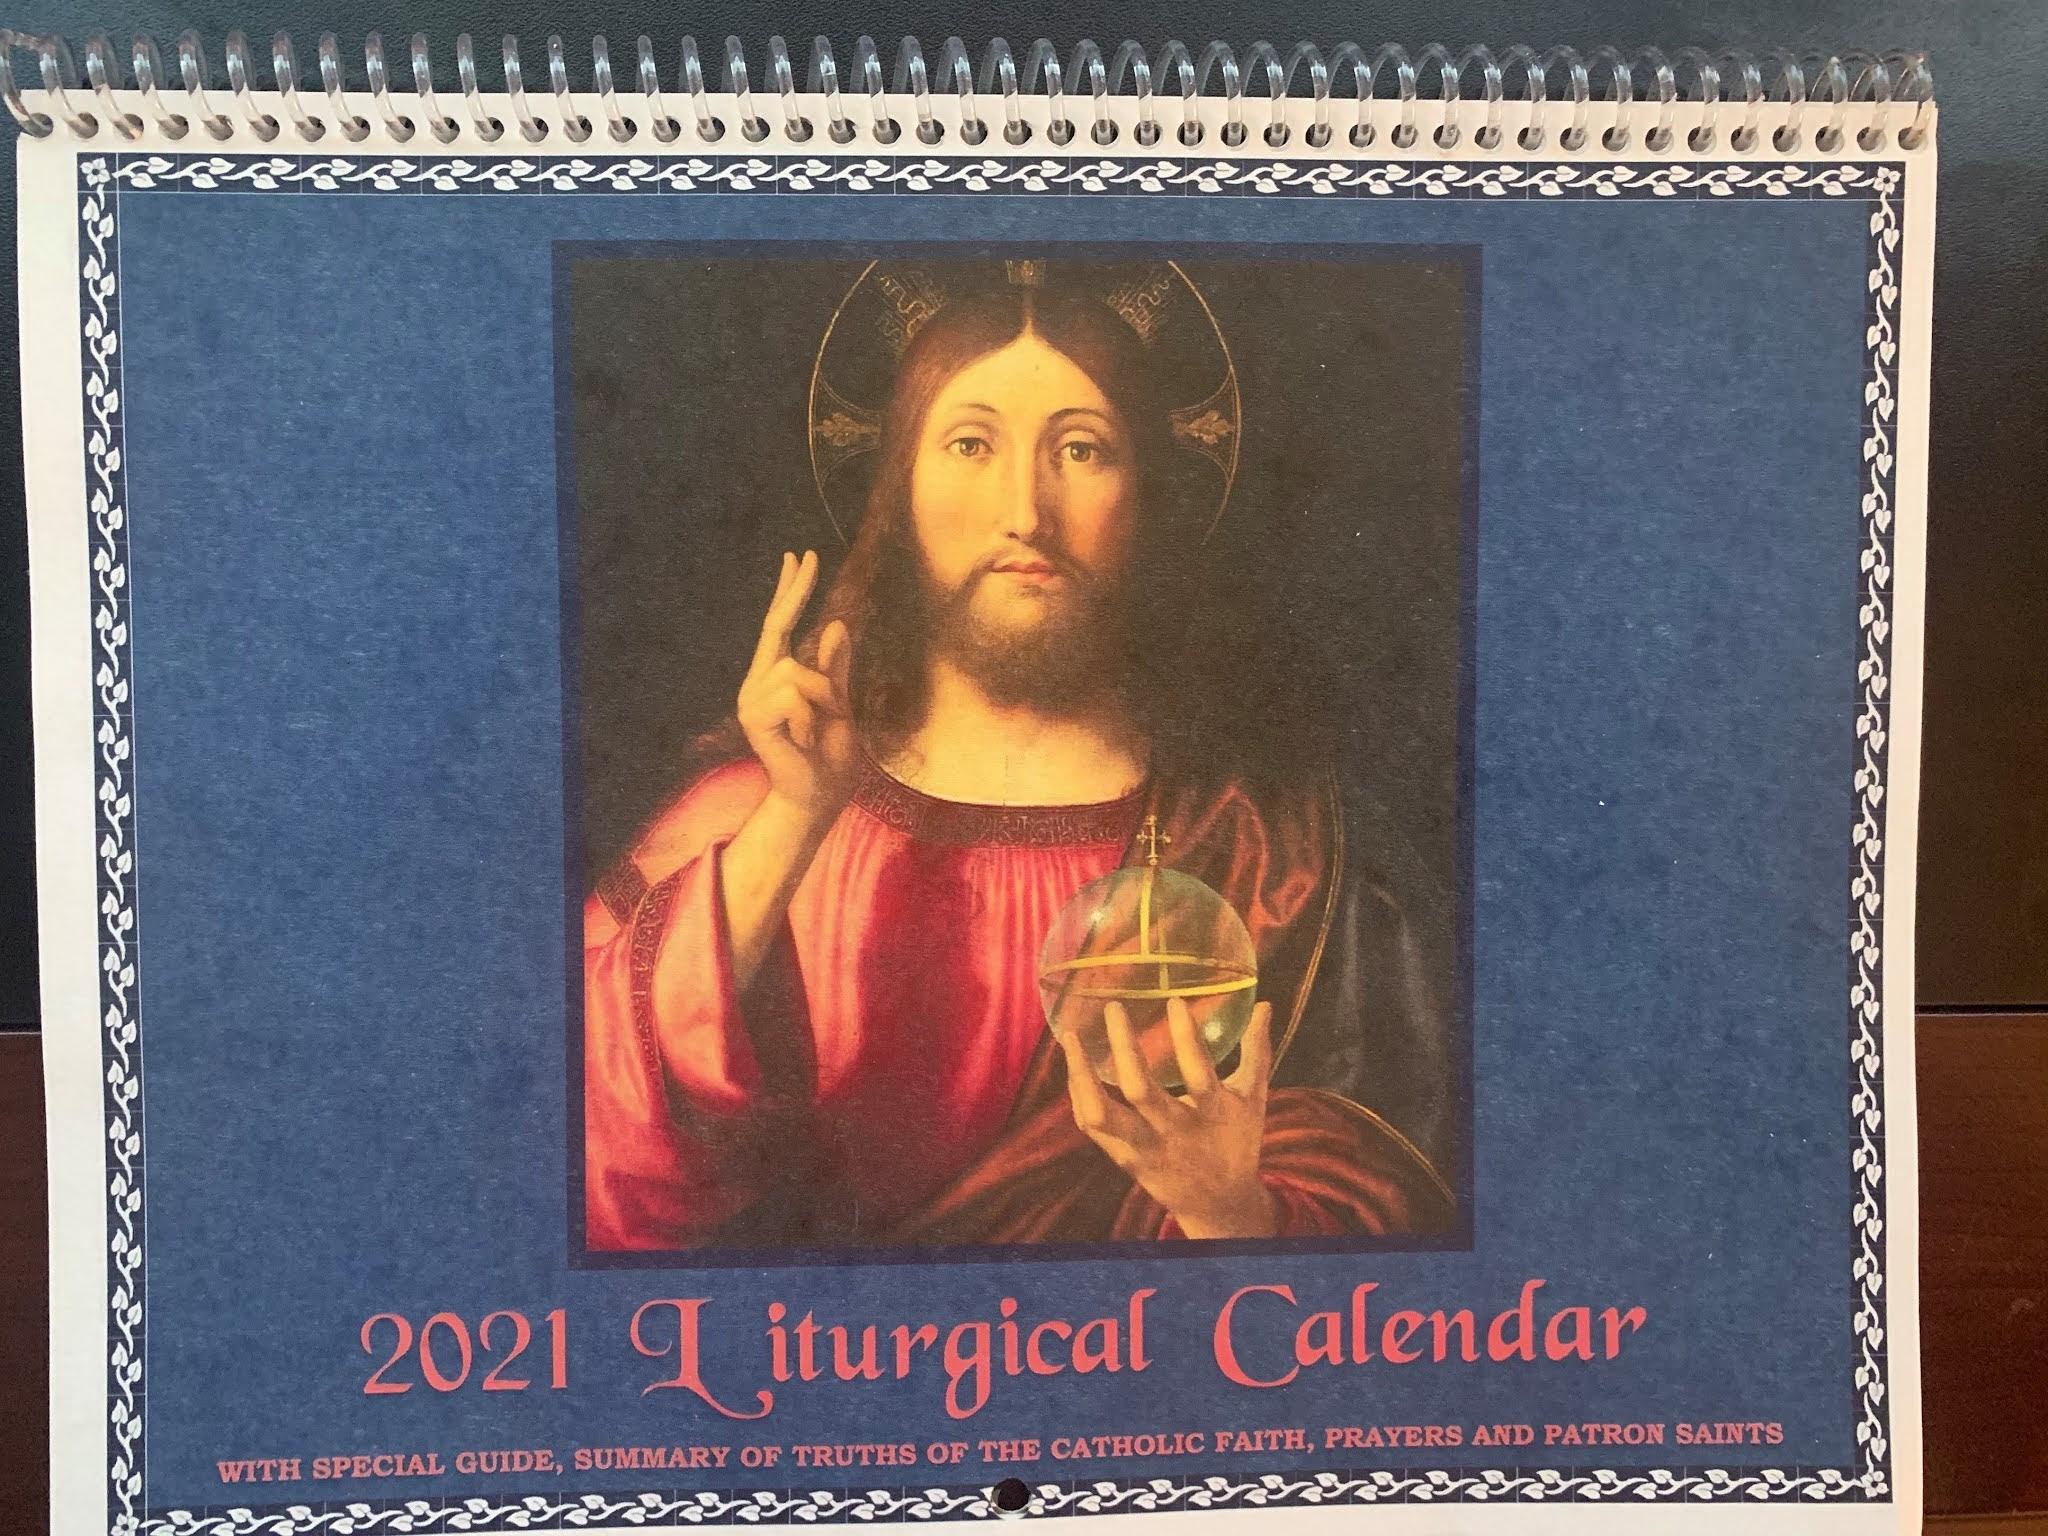 Rorate Cæli: 2021 Liturgical Calendar Season Begins